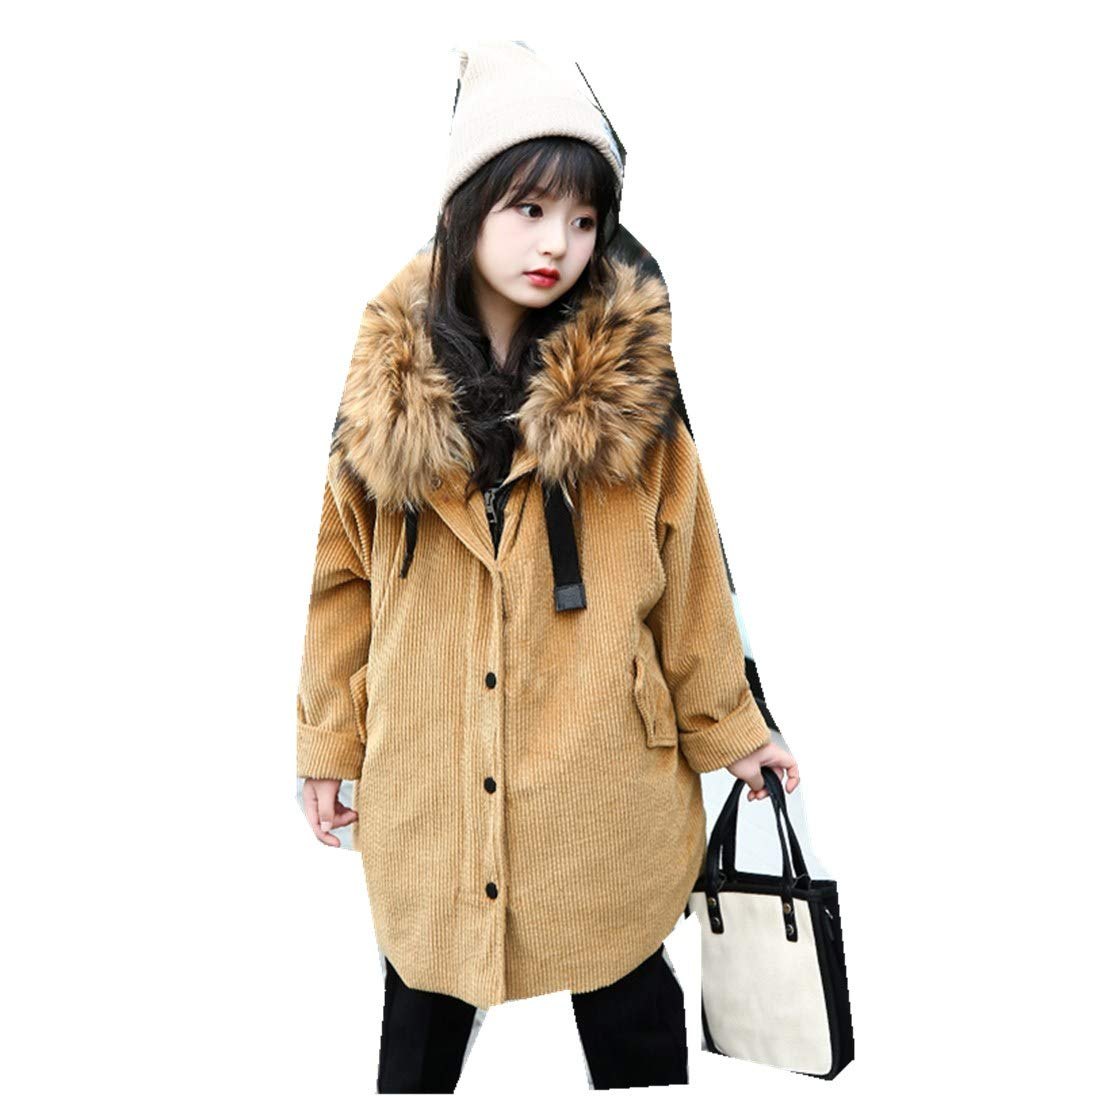 MV Girls Cotton New Thick Winter Long Cotton Suit Childrens Coat Kids Clothing